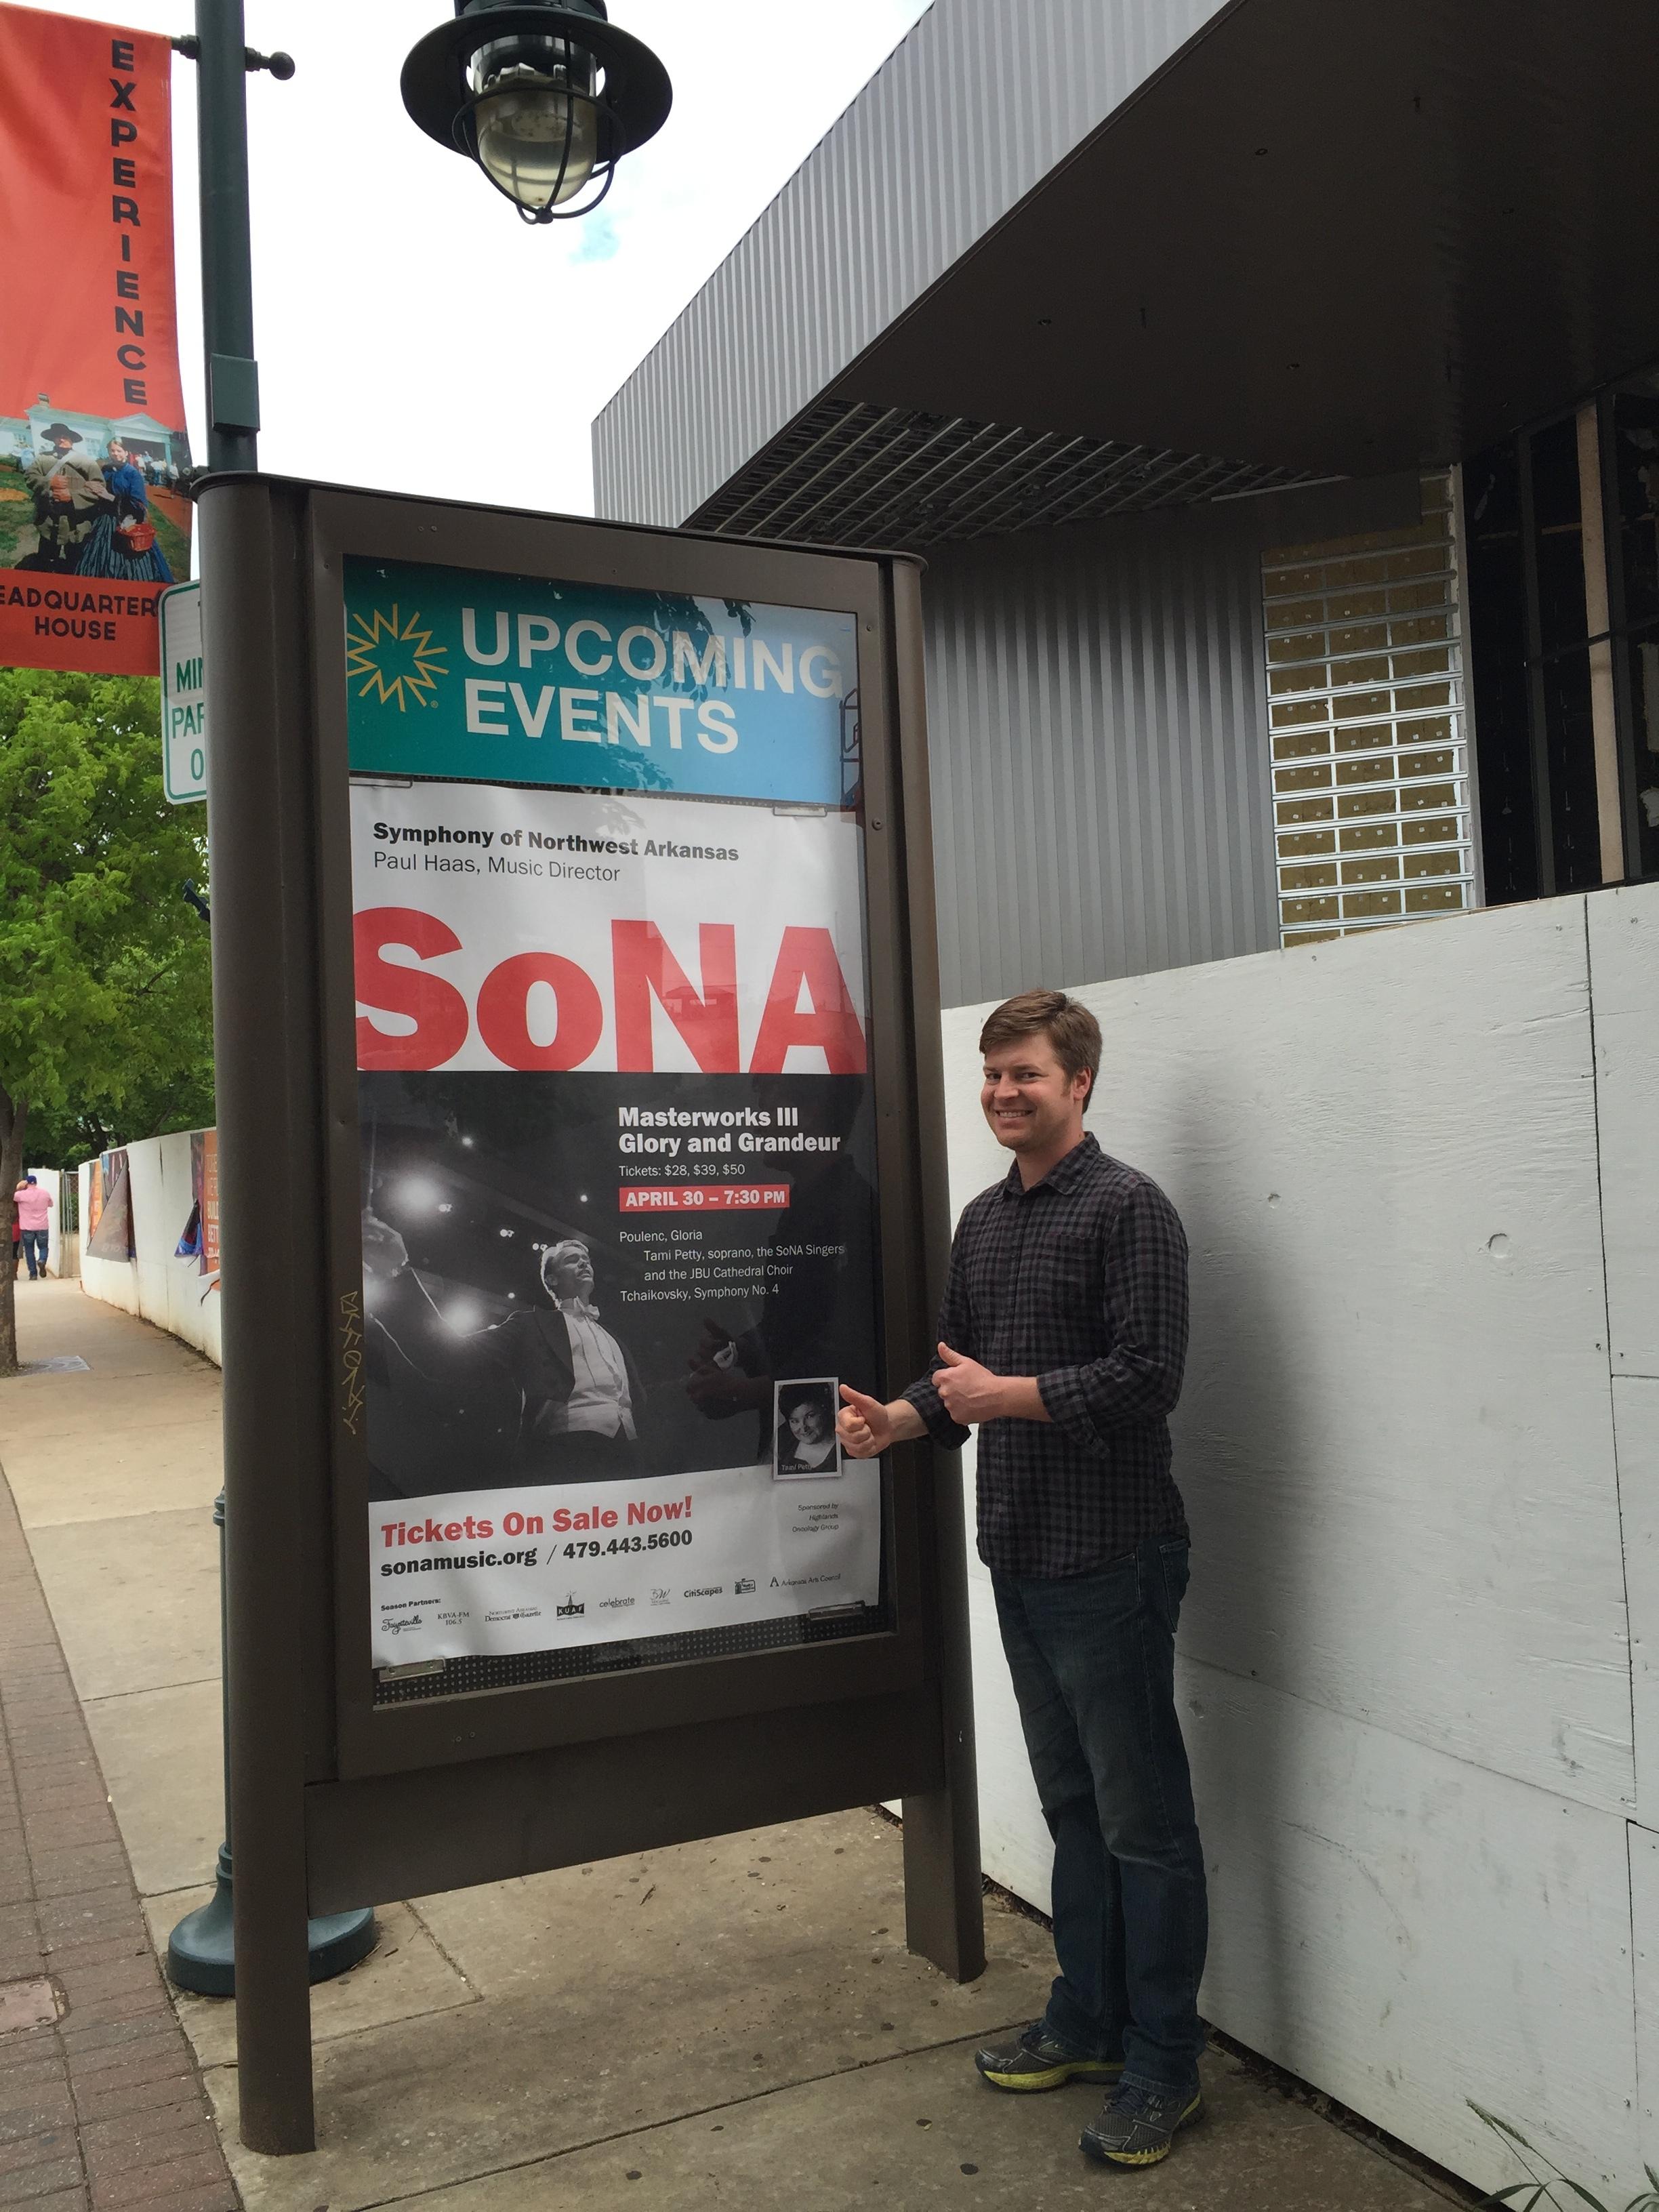 Nice add for SoNA in Fayetteville.